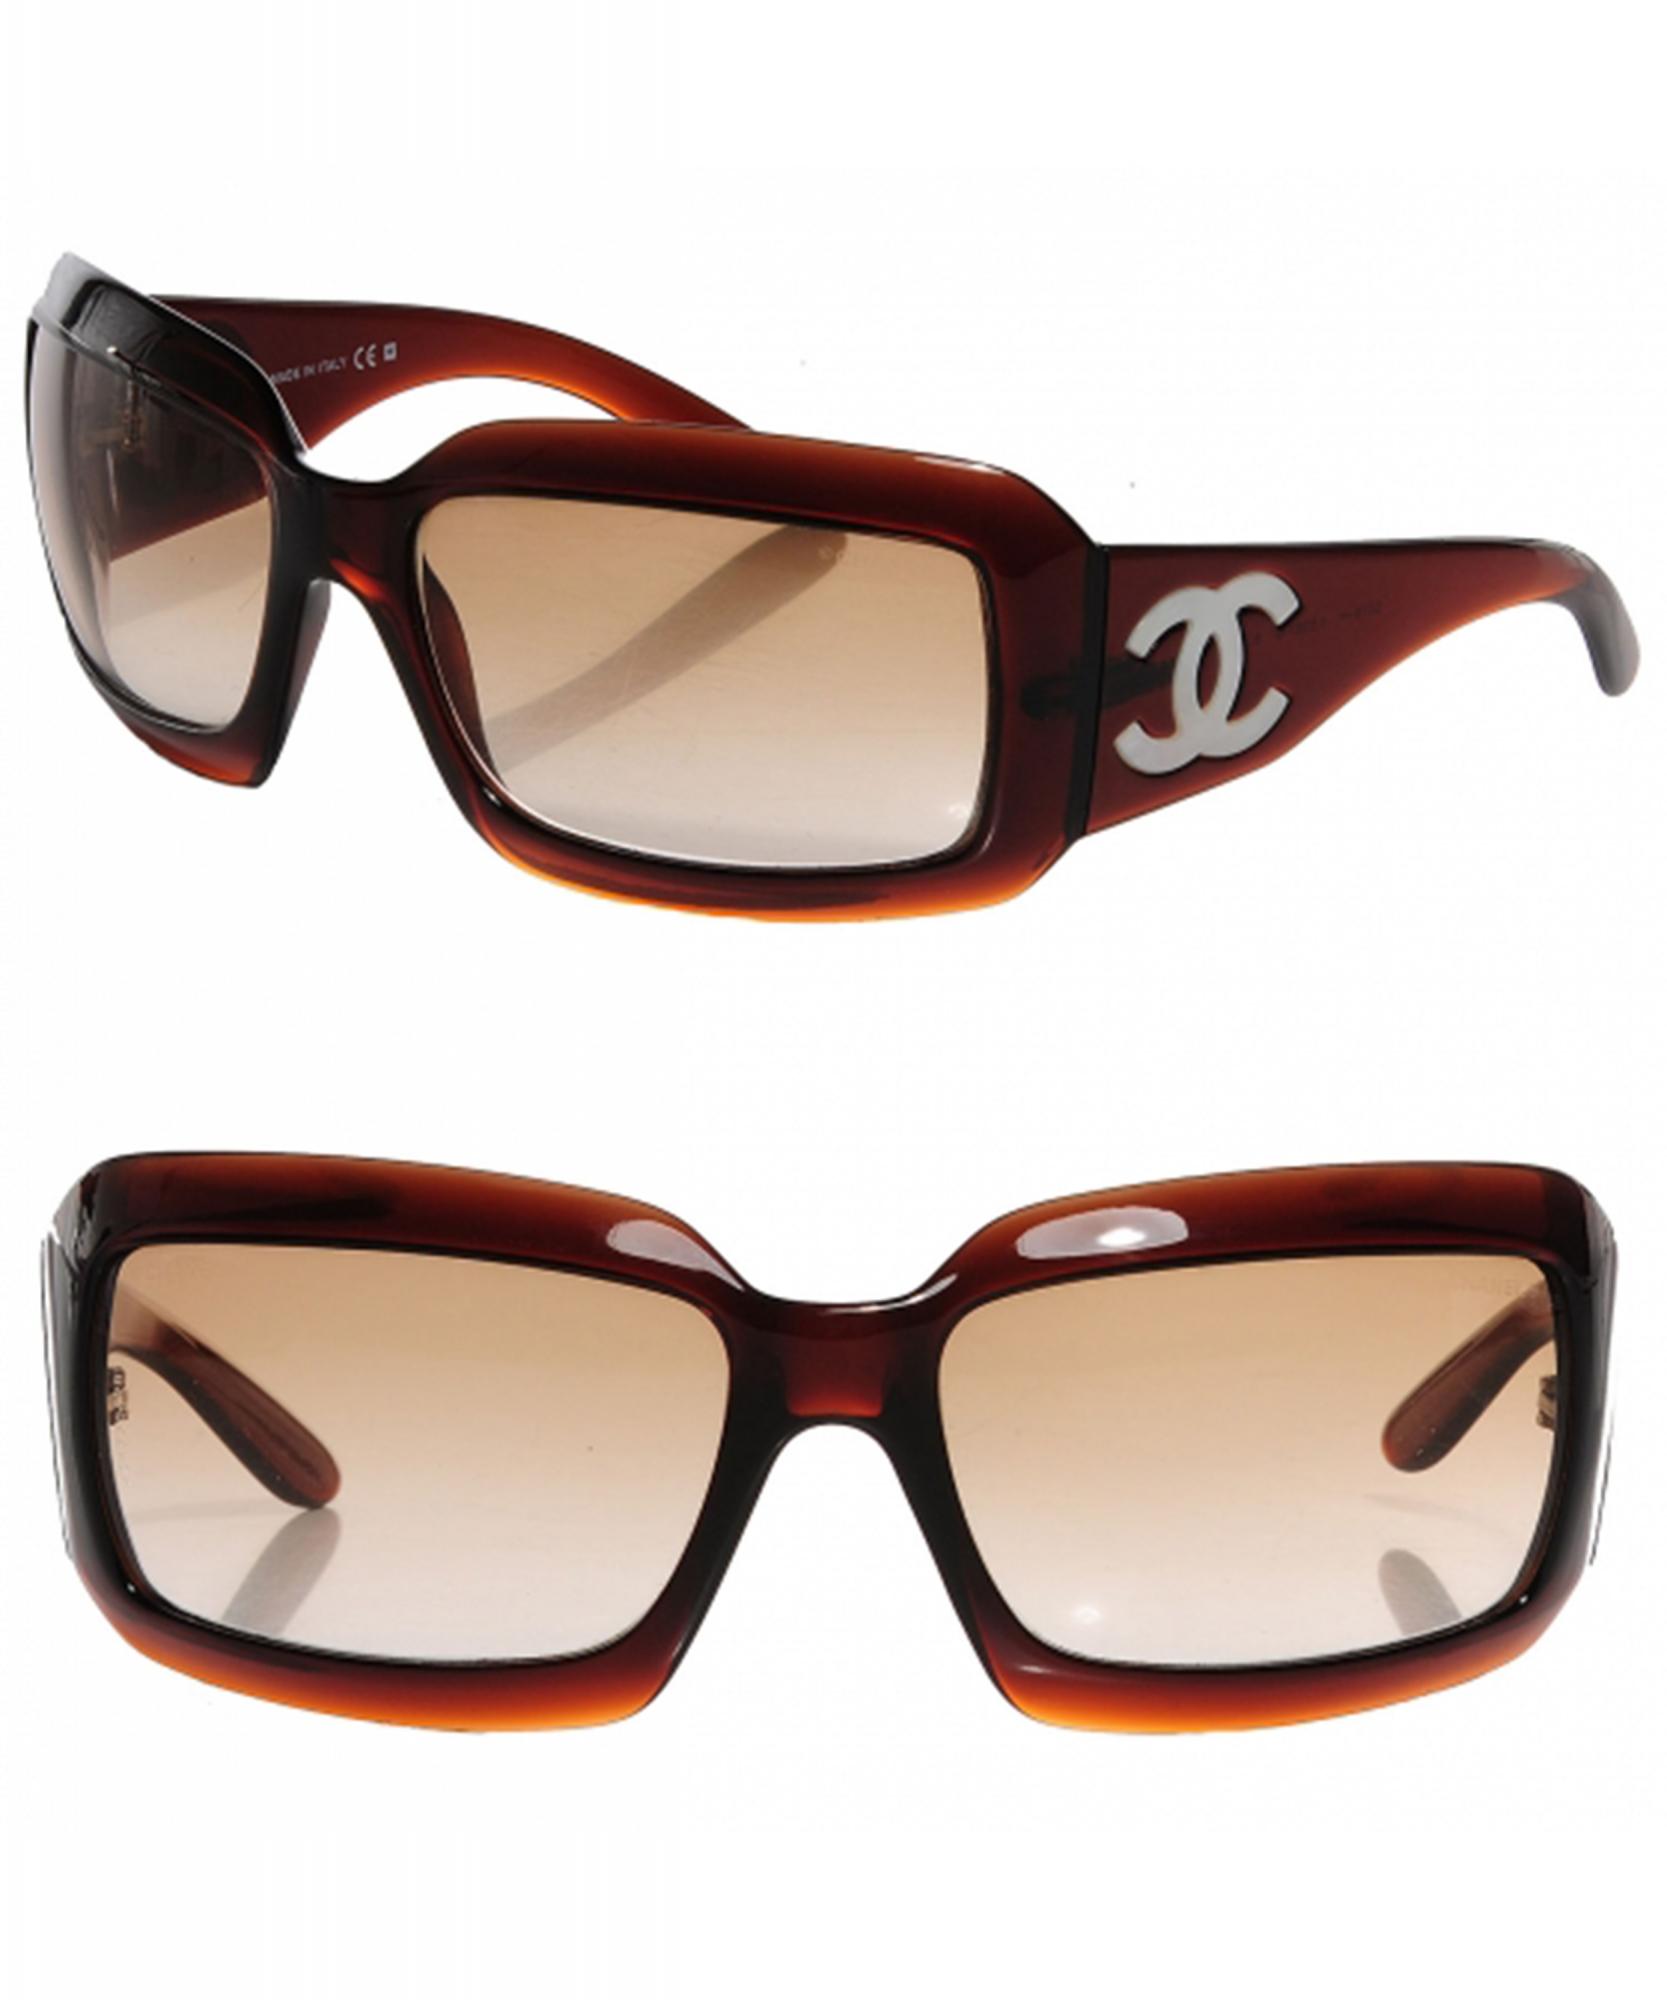 056f223e617 Chanel Mother of Pearl Sunglasses 5076-H Brown